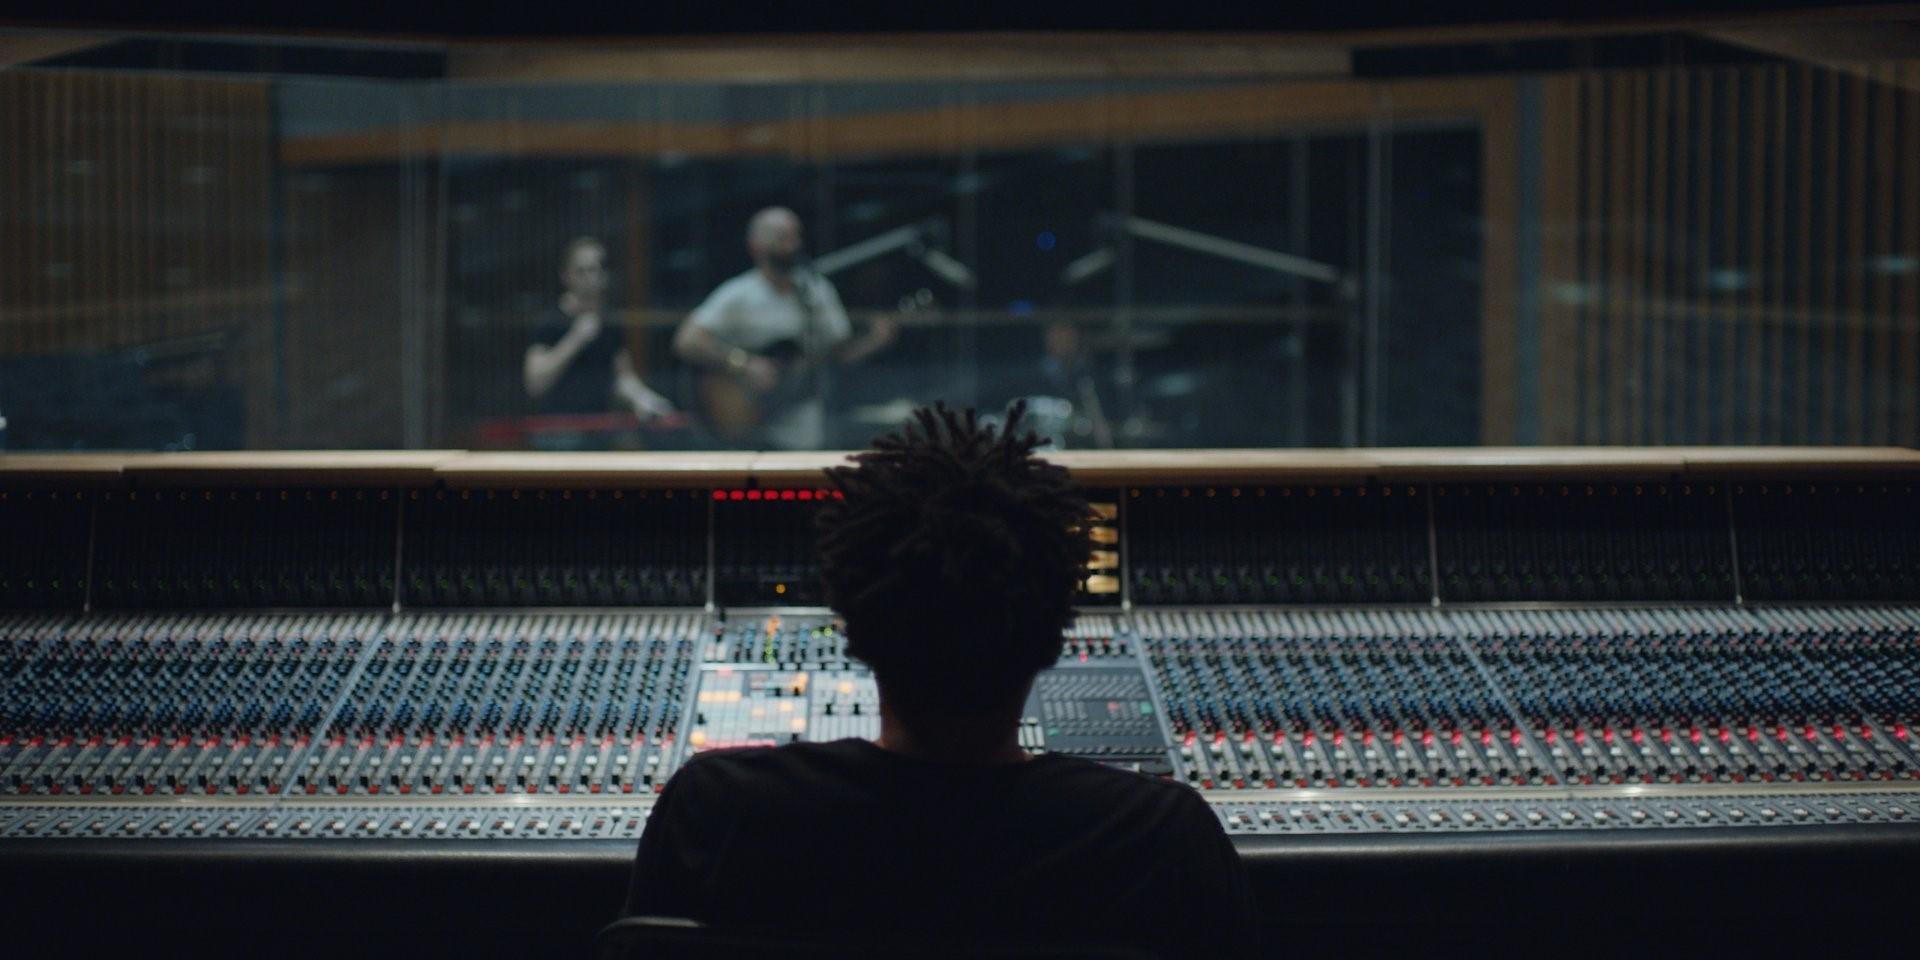 Ibm watson помогает музыкантам сочинять музыку